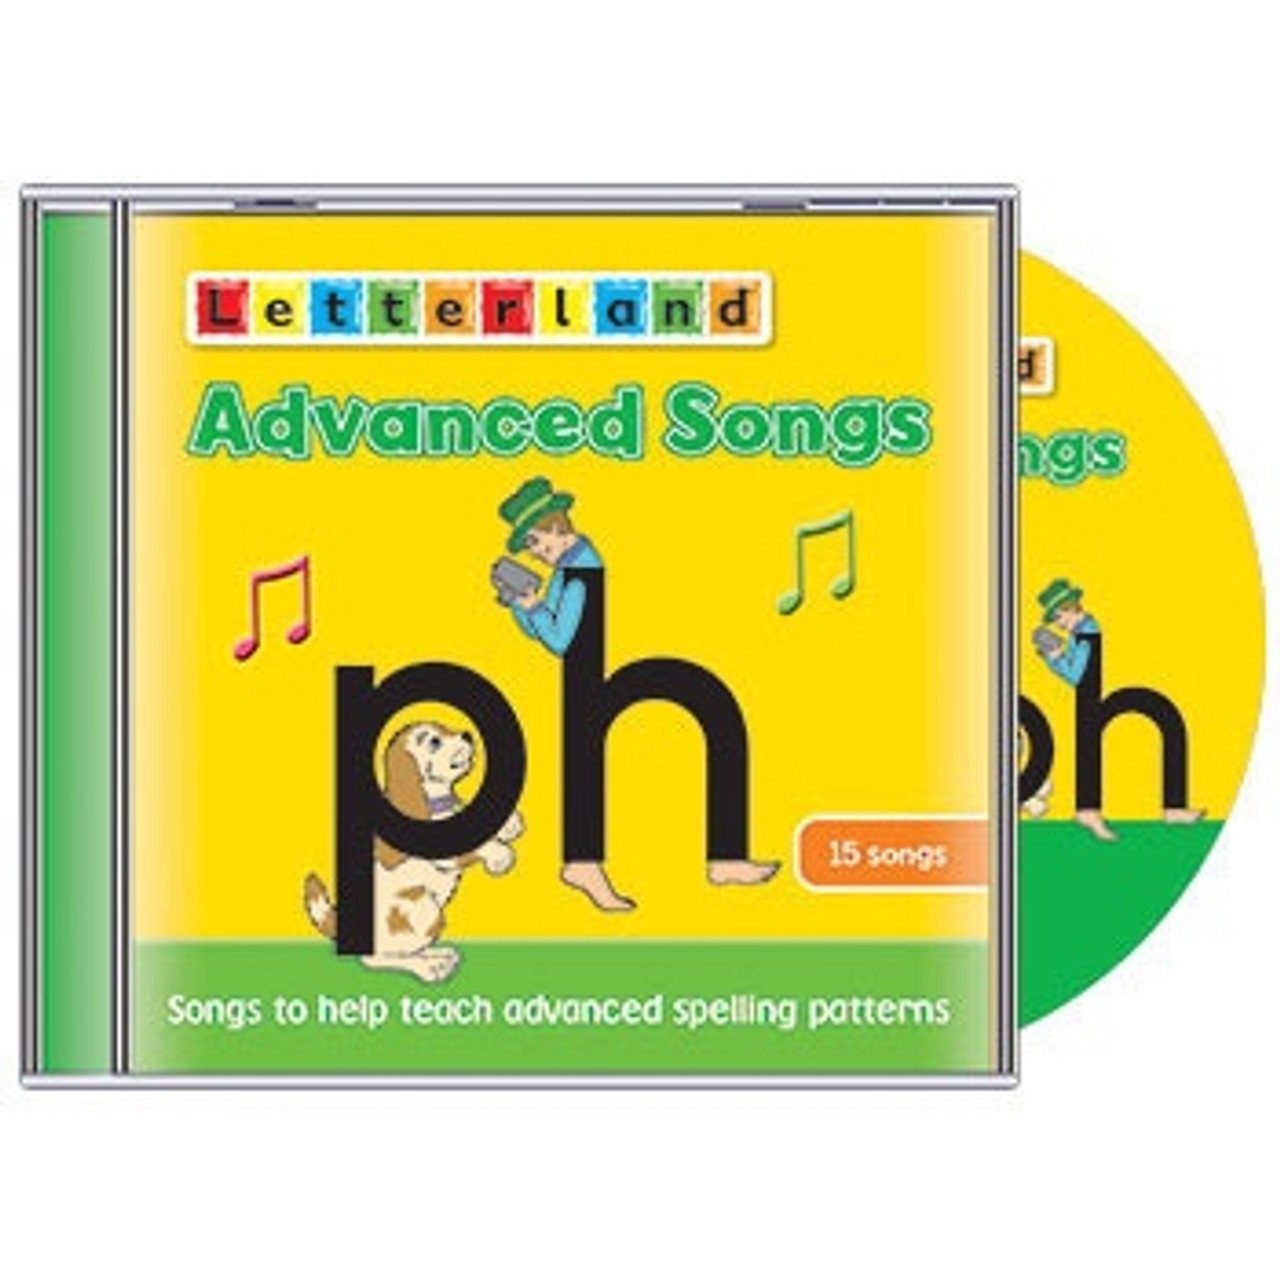 ADVANCED SONGS CD